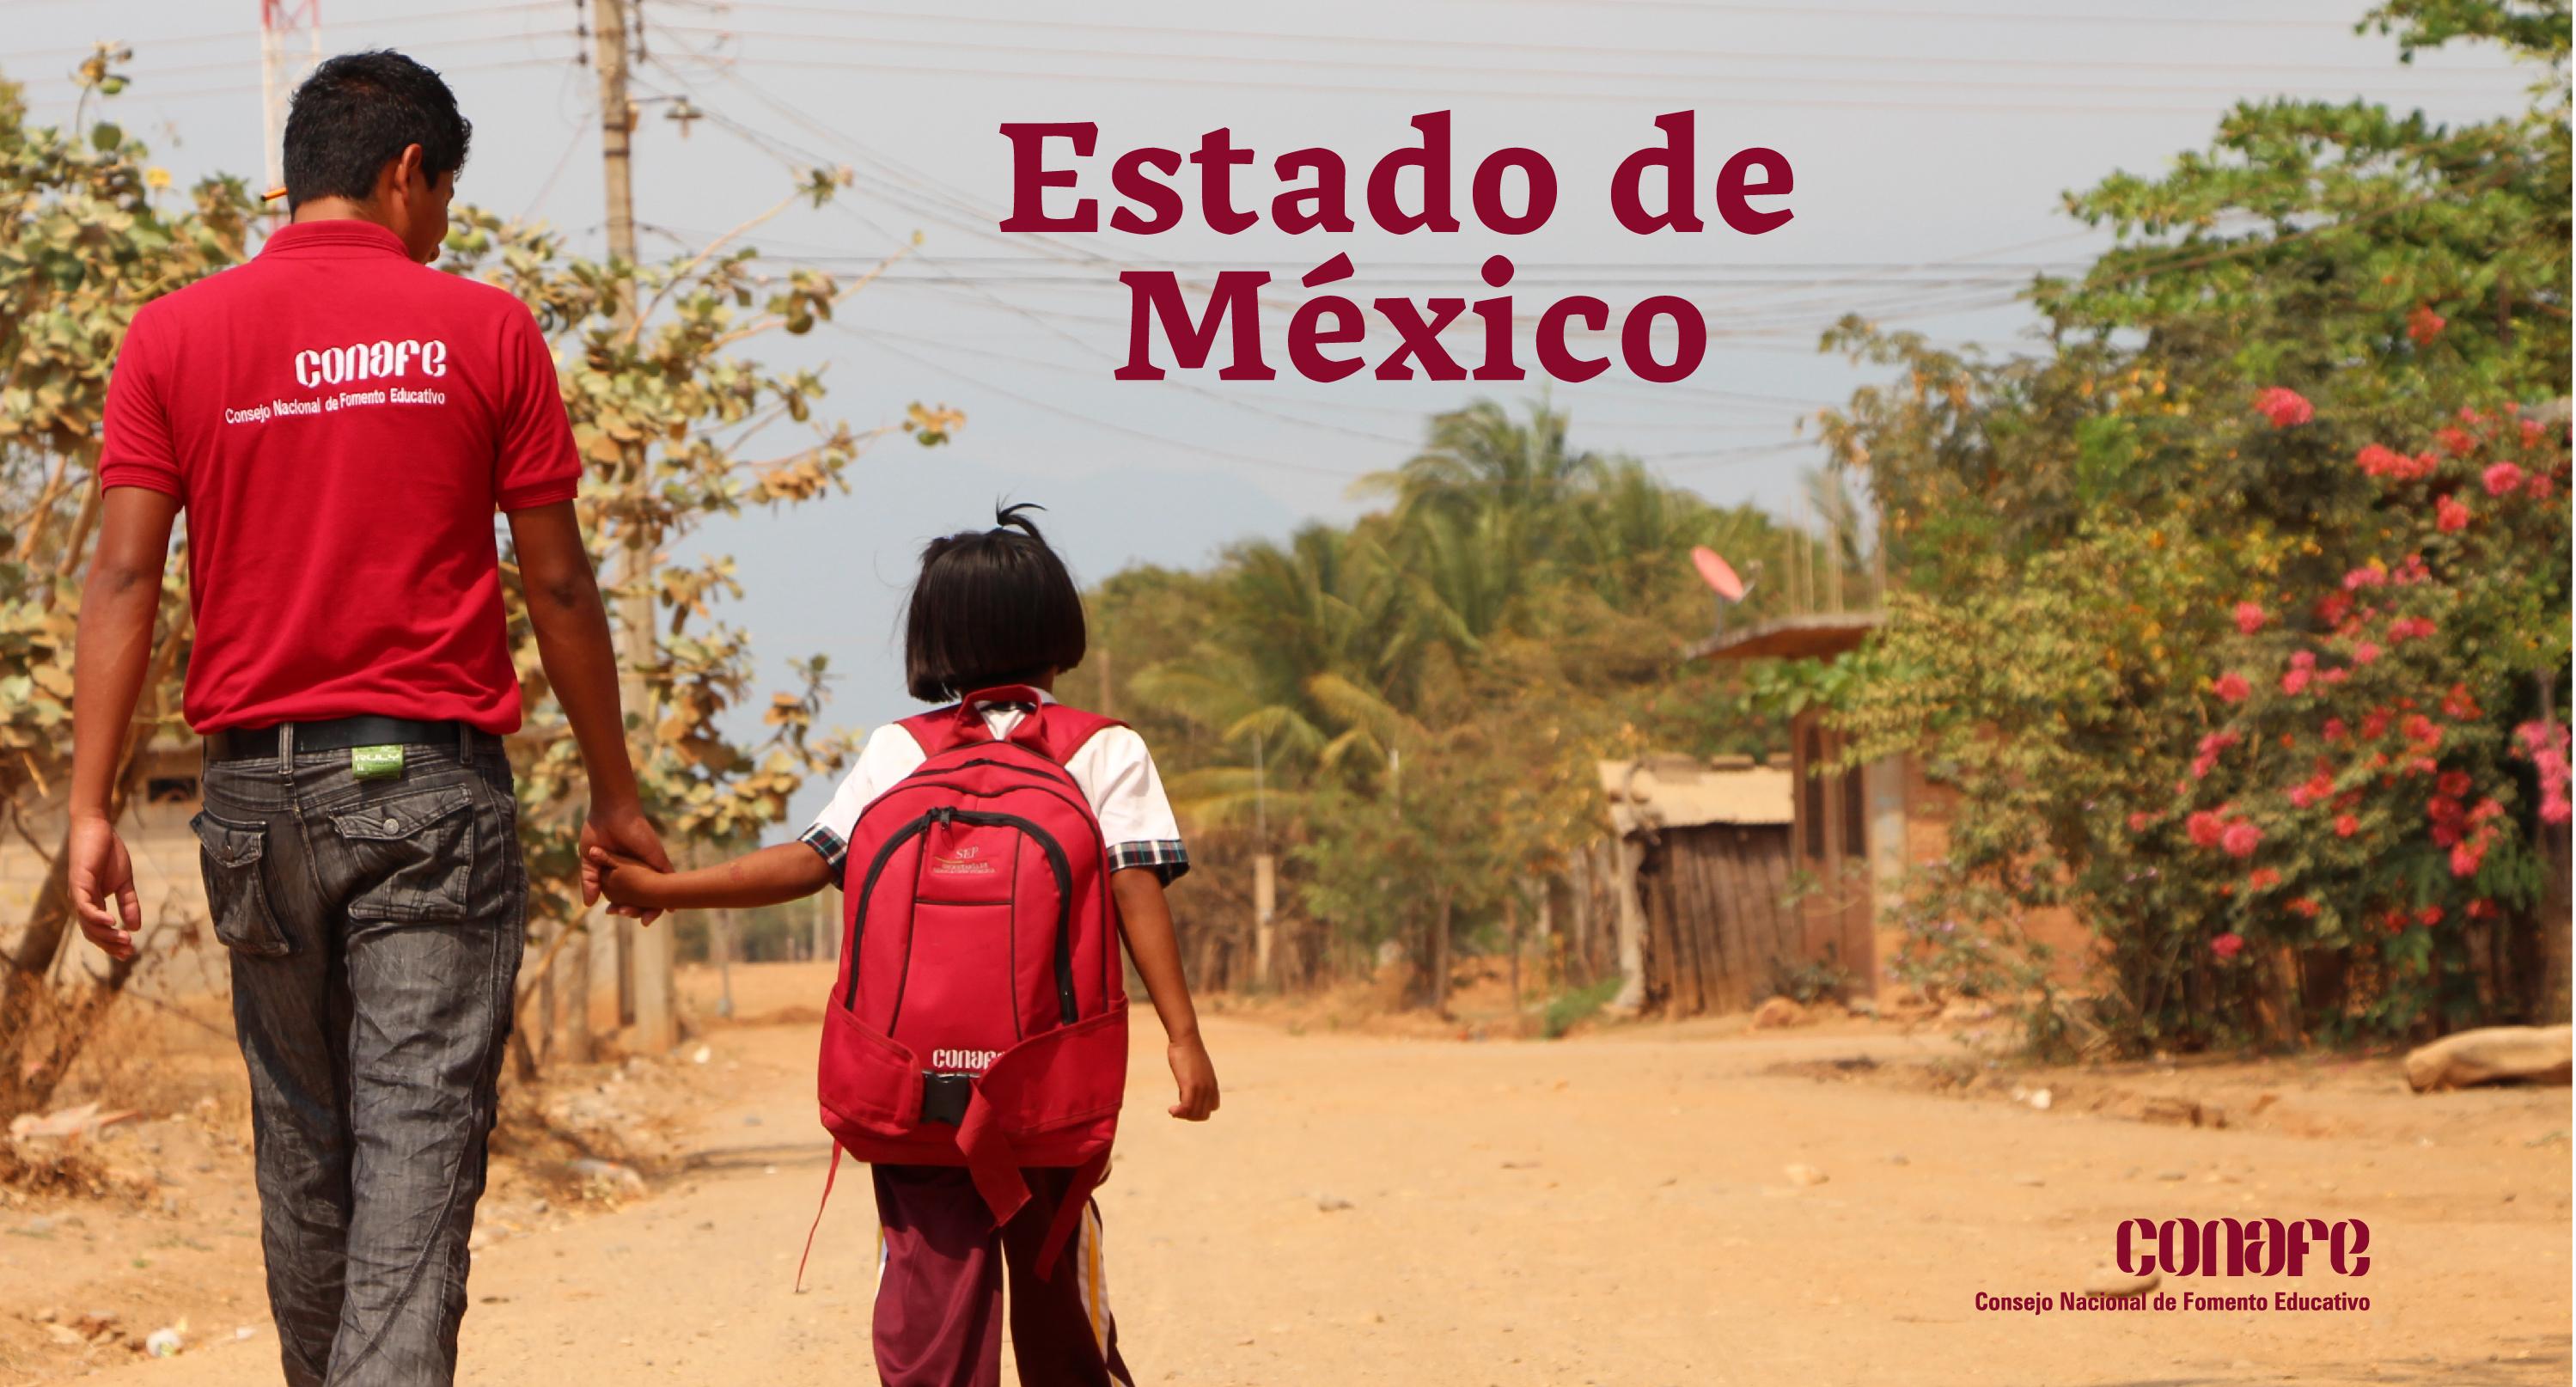 Delegación Conafe Estado de México